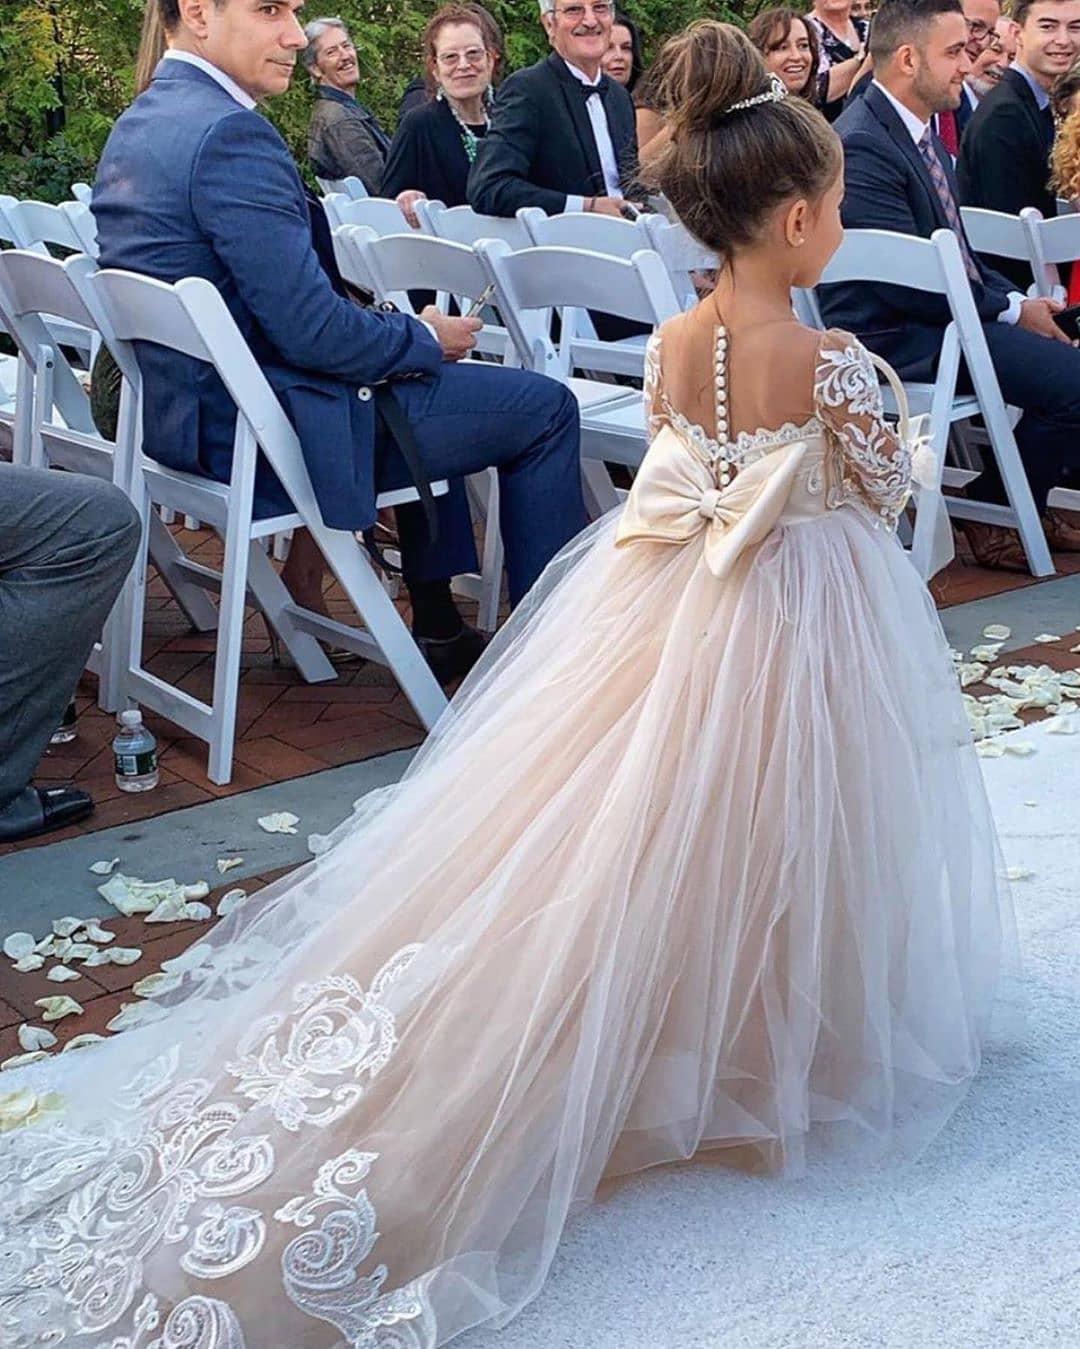 Little Princess 4Dresses Vintageroseby - Weddings